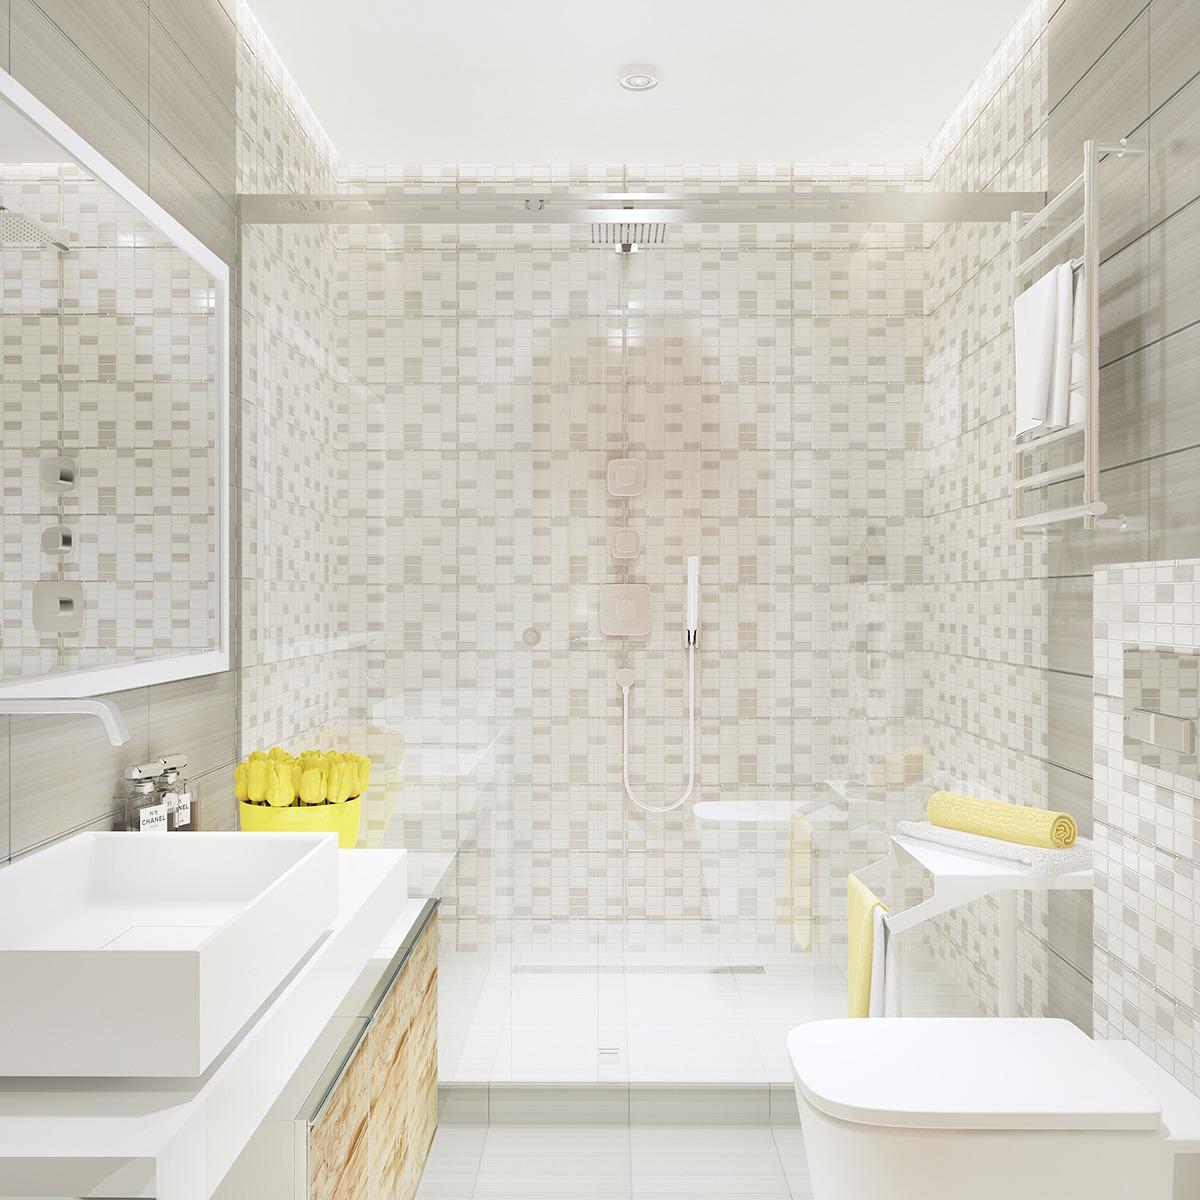 graytilebathroom  Interior Design Ideas